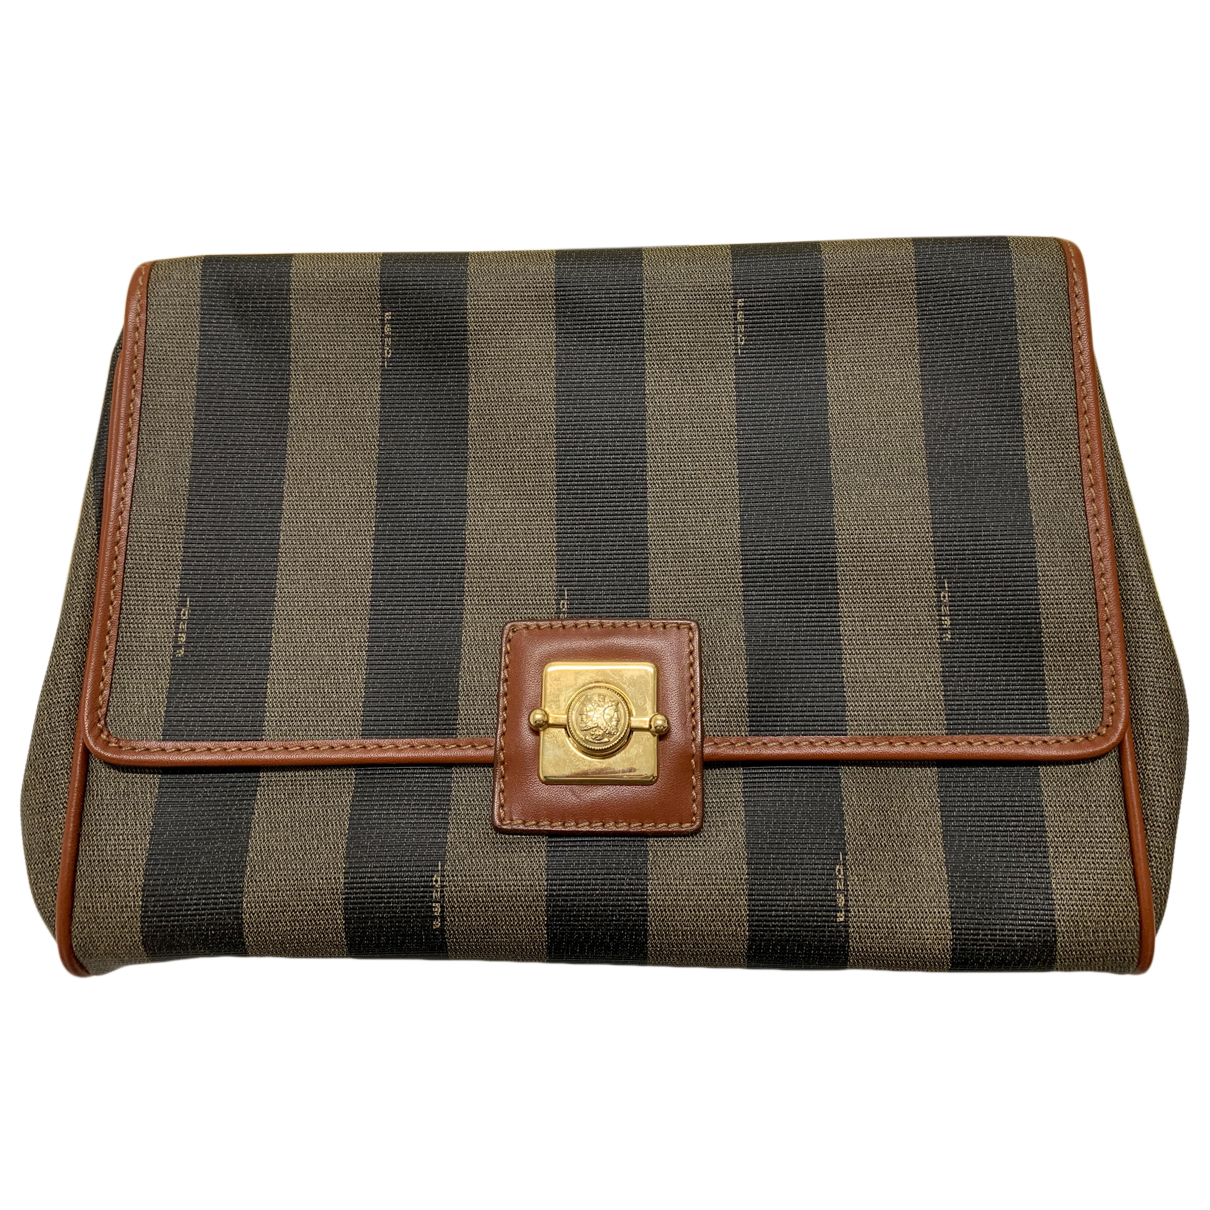 Fendi N Brown Leather handbag for Women N